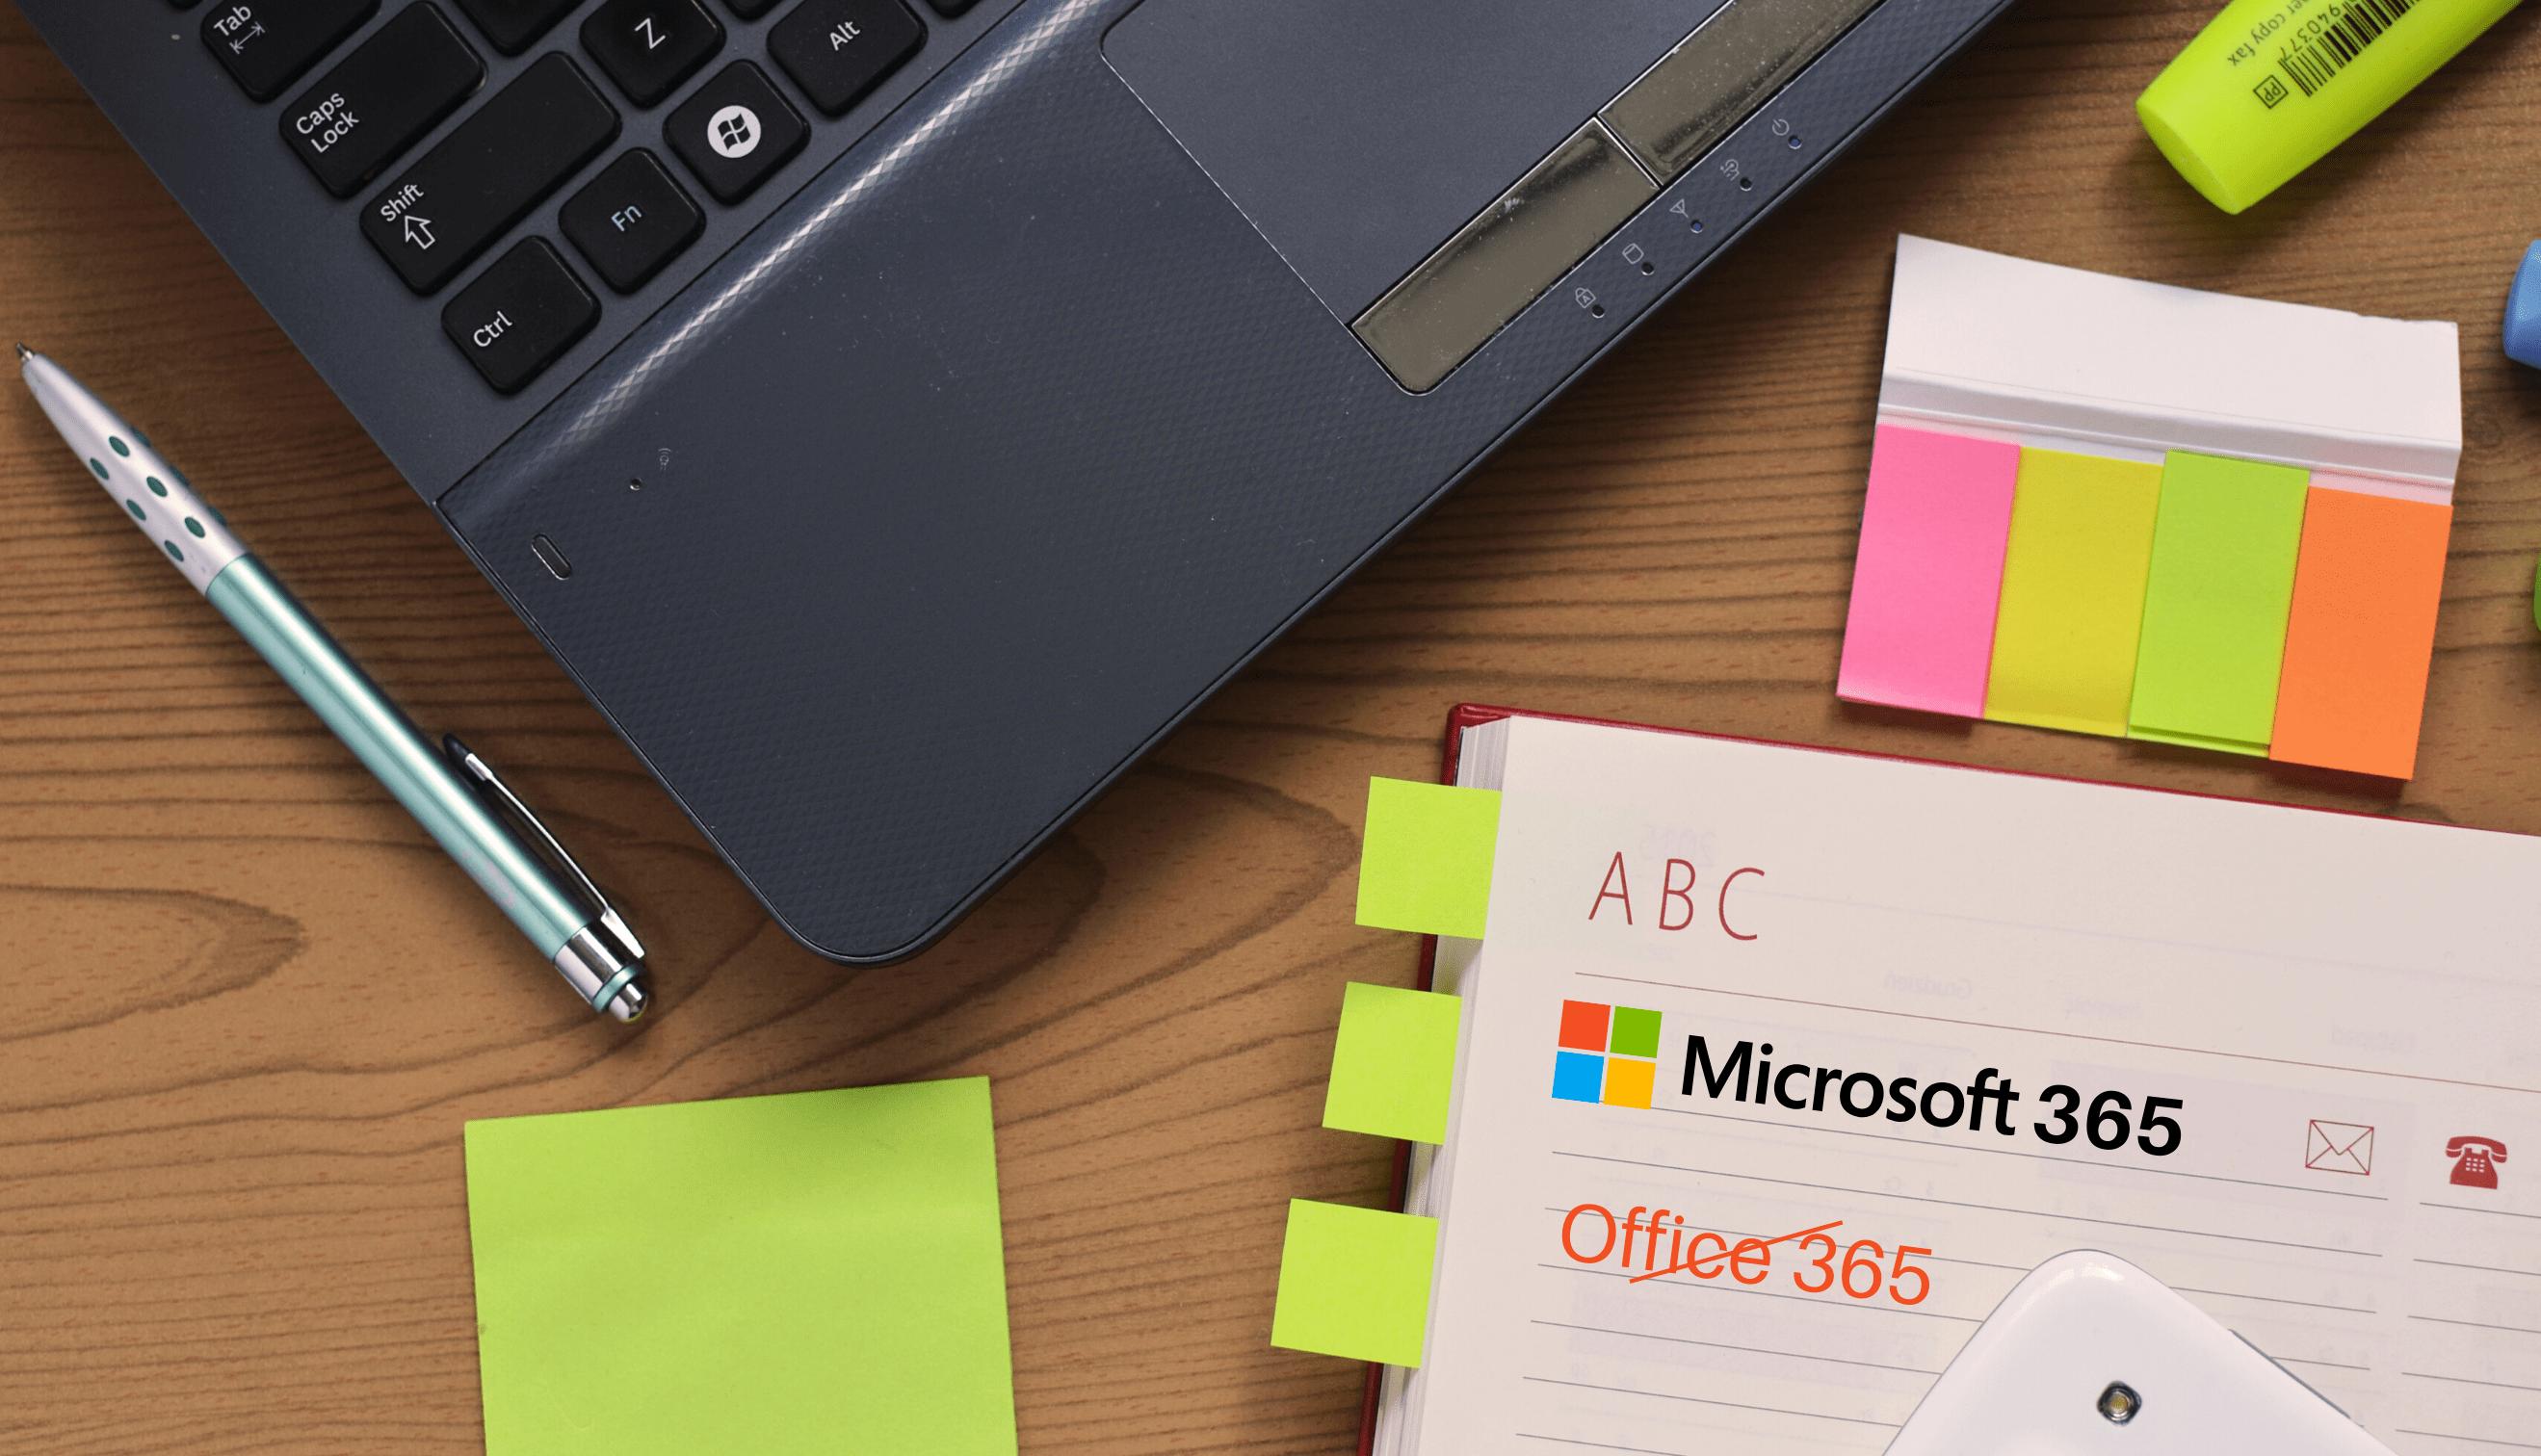 Offres : Les offres Office 365 deviennent Microsoft 365